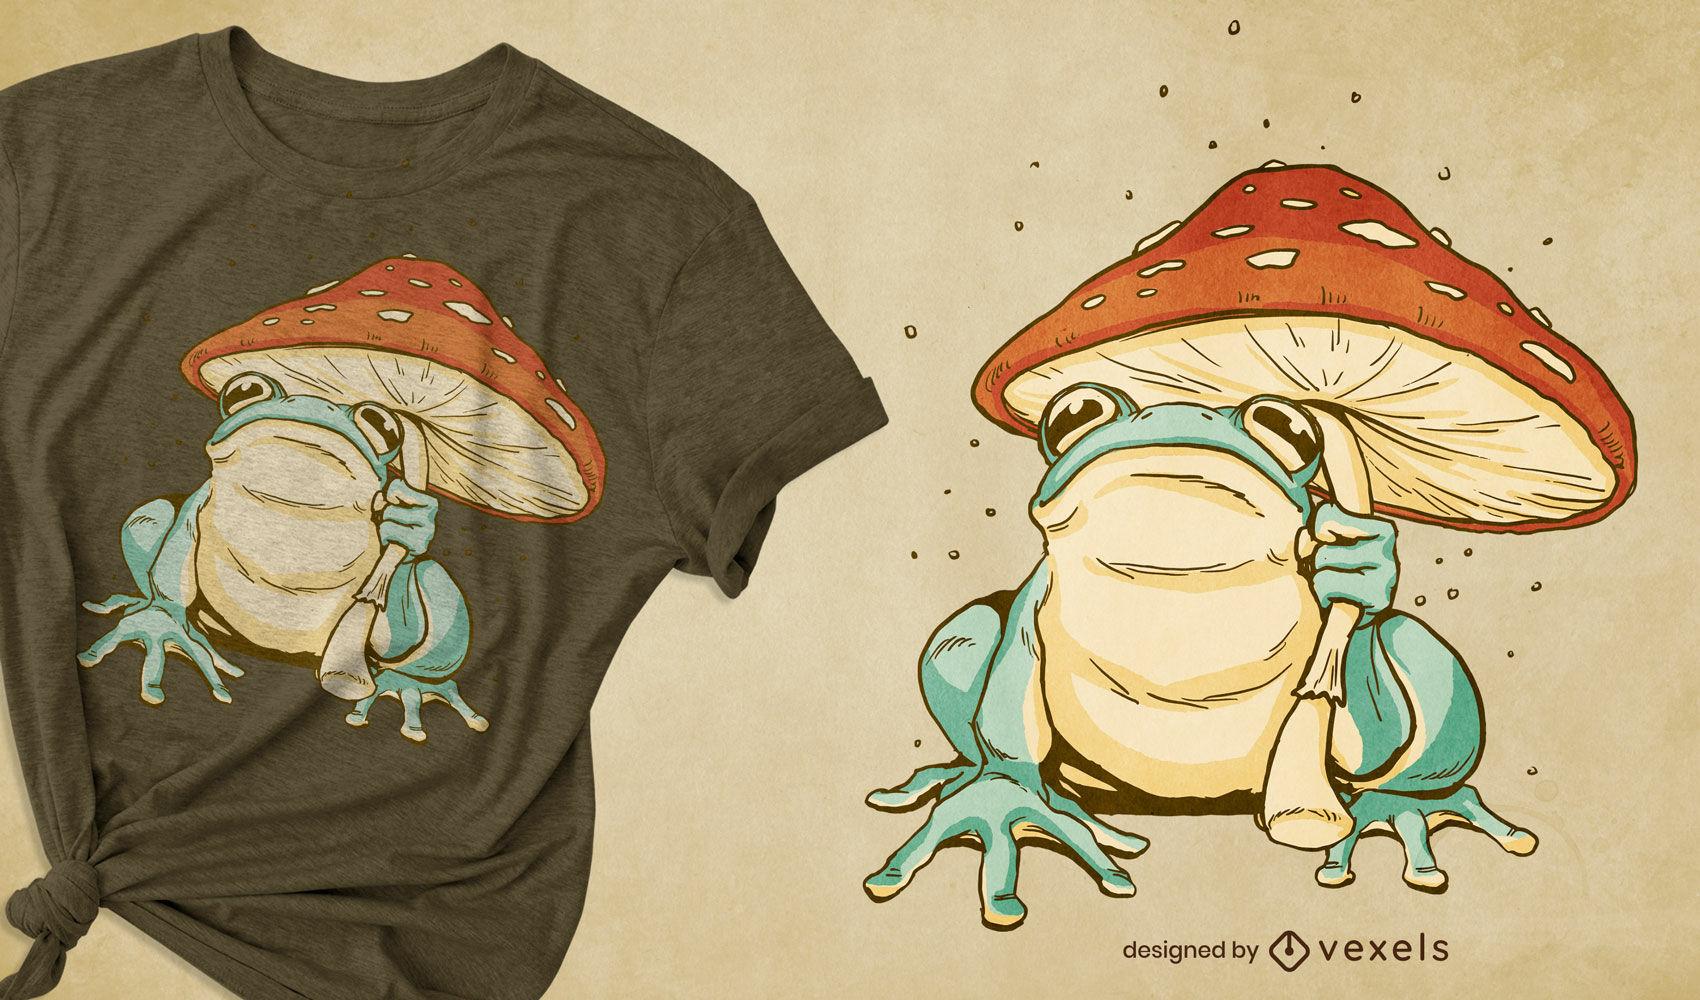 Frog mushroom umbrella t-shirt design